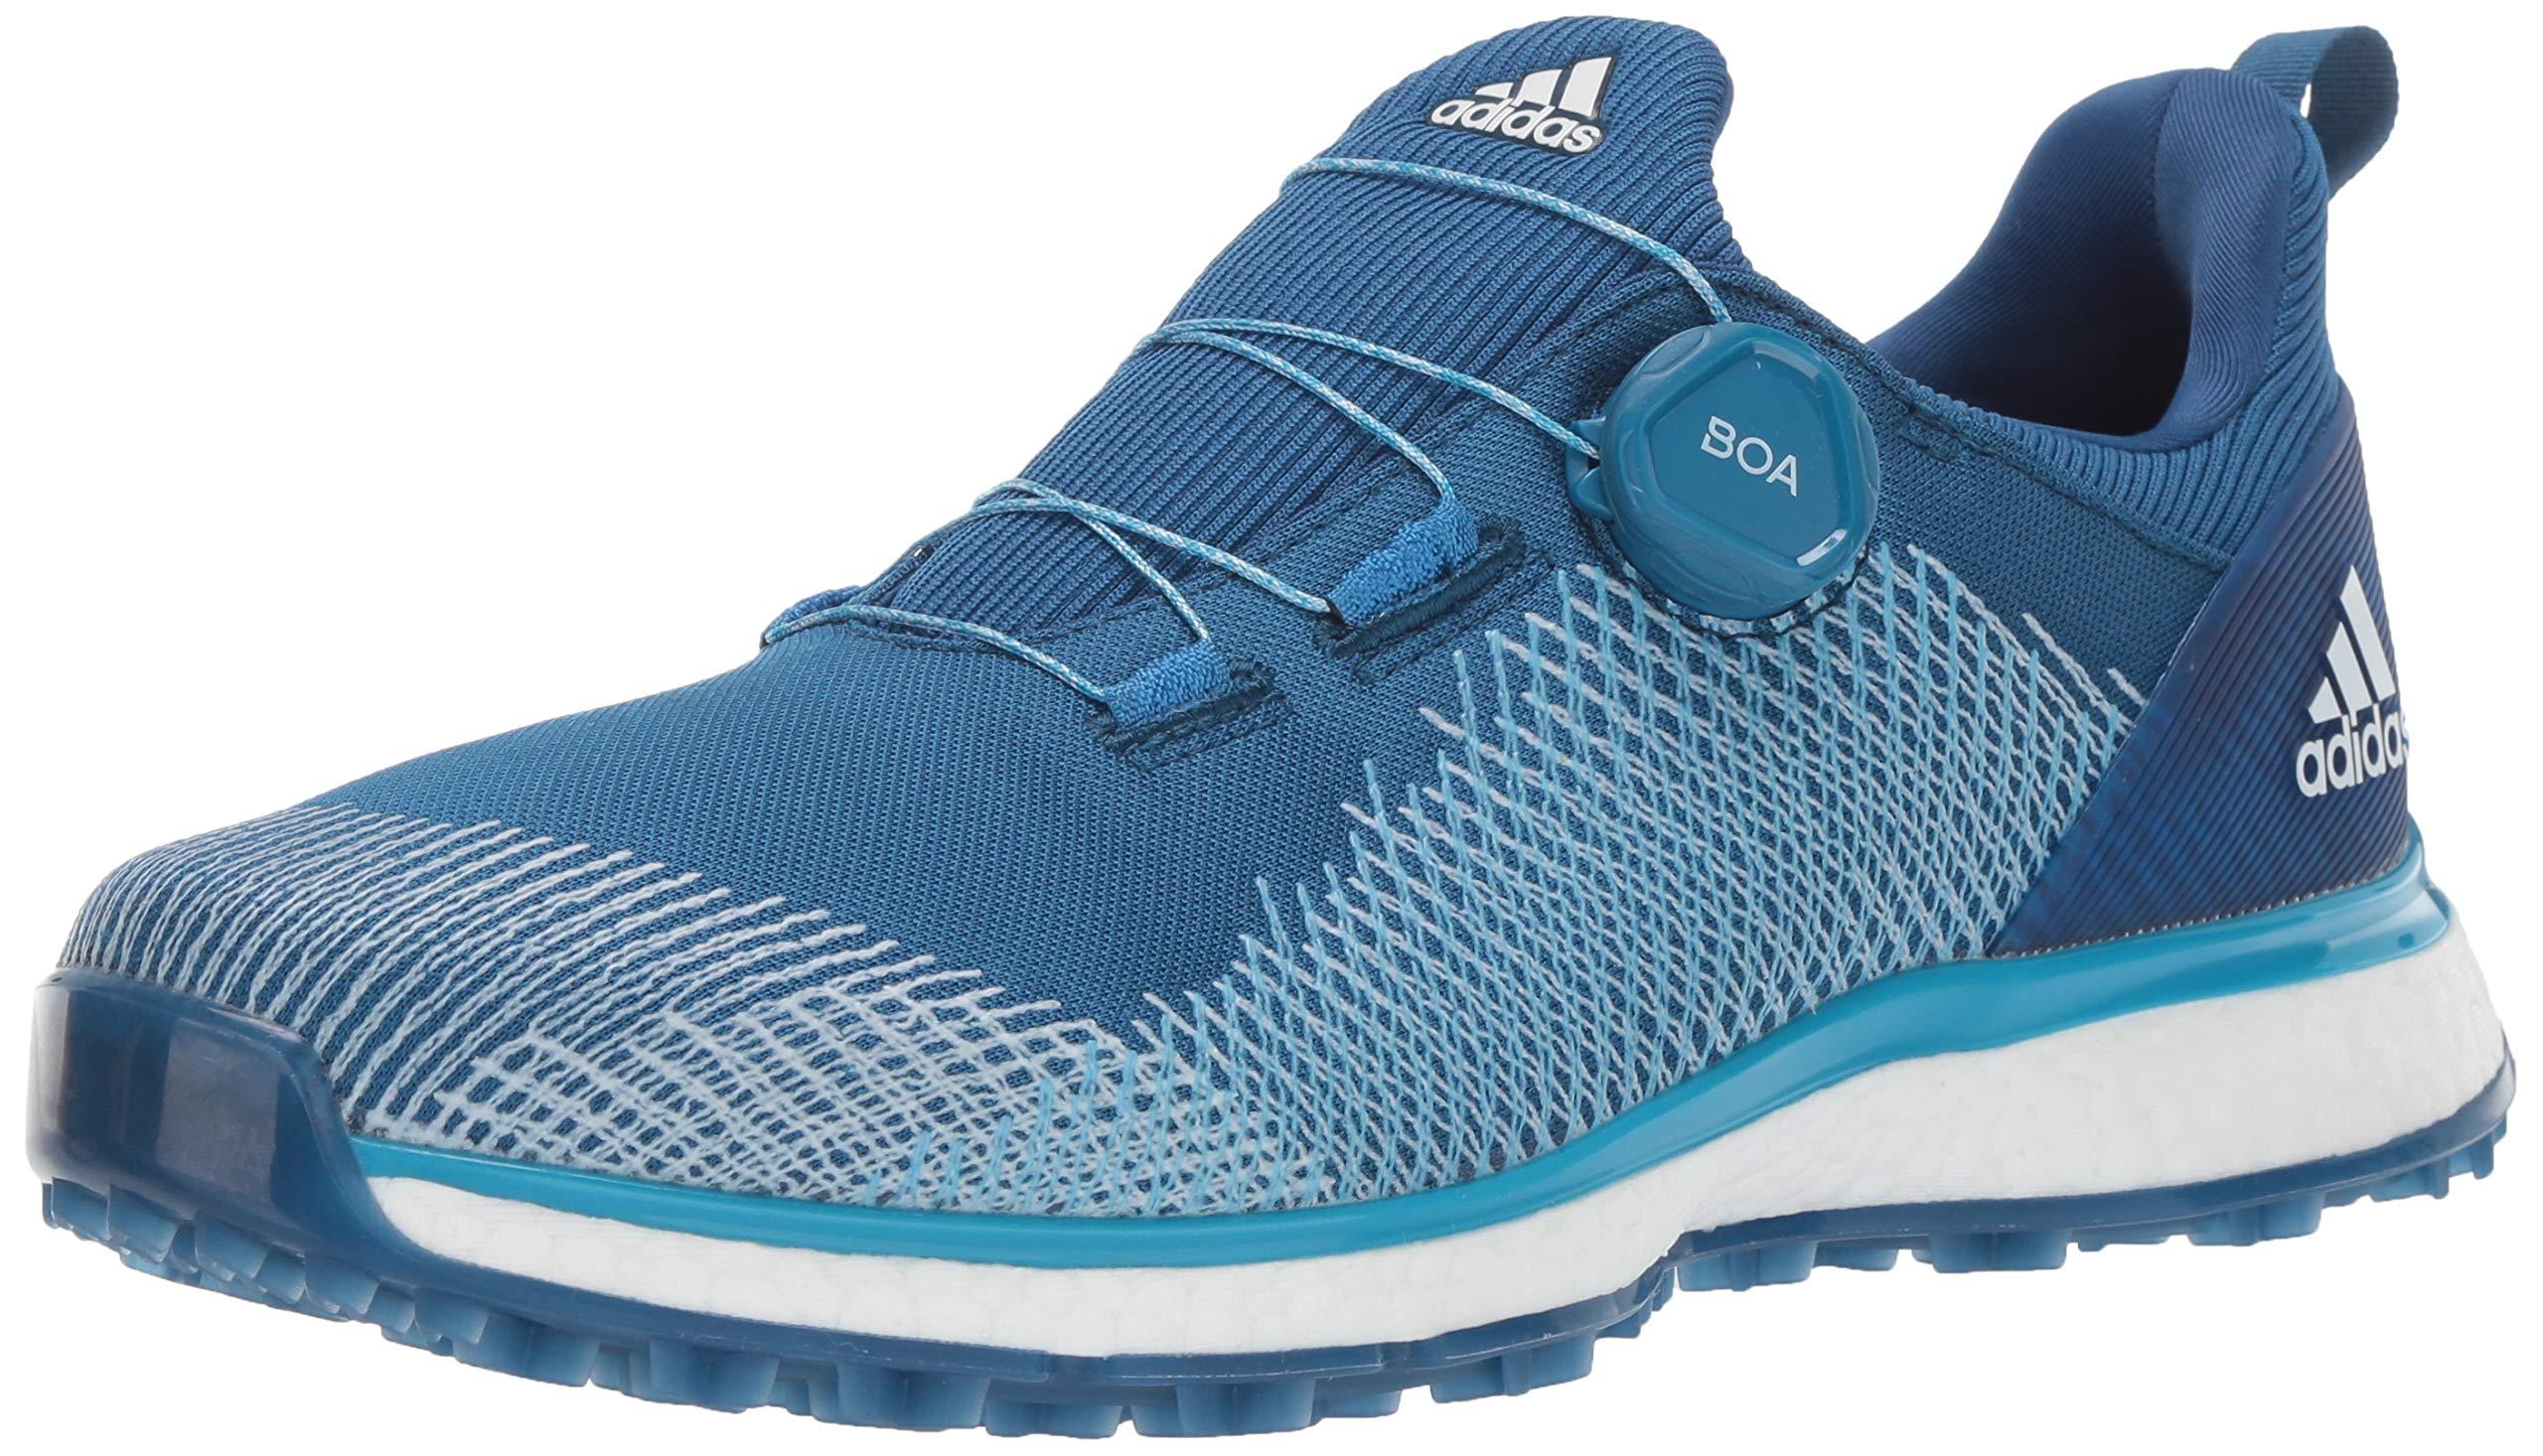 adidas Men's FORGEFIBER BOA Golf Shoe Dark Marine/Shock Cyan/FTWR White 7 M US